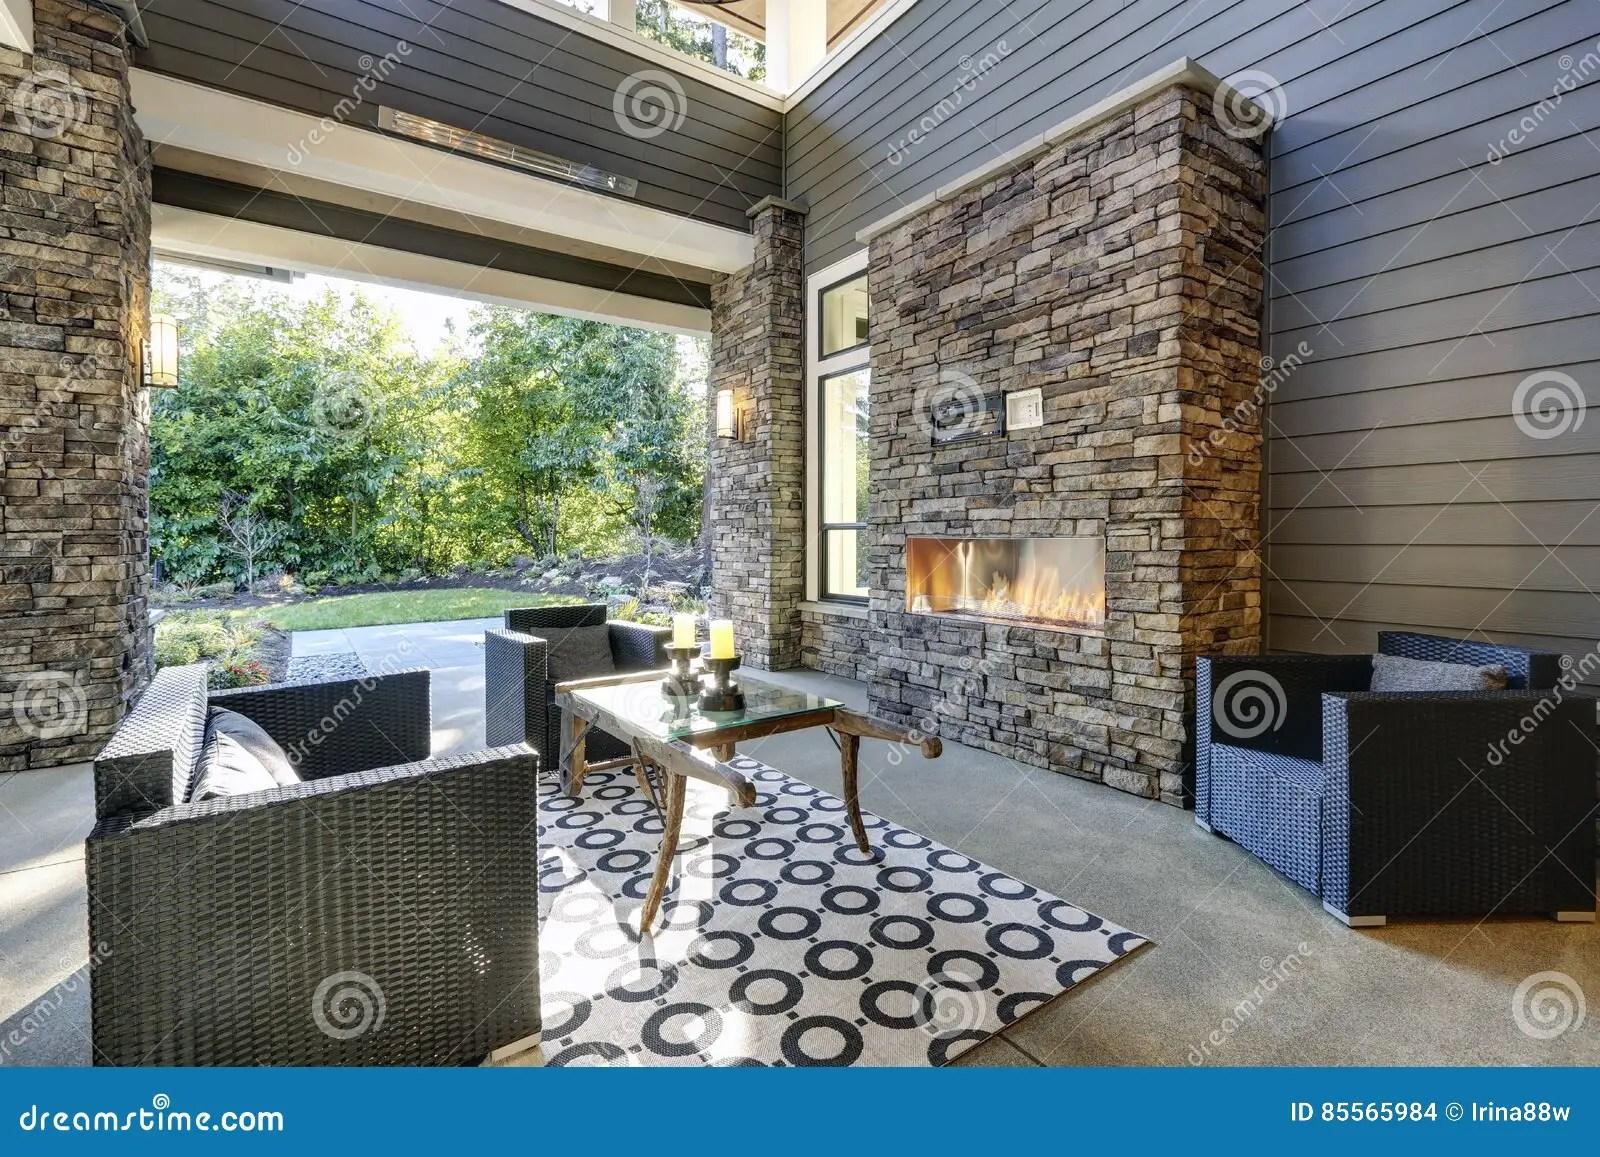 well designed covered patio boasts stone fireplace stock photo image of stone outside 85565984